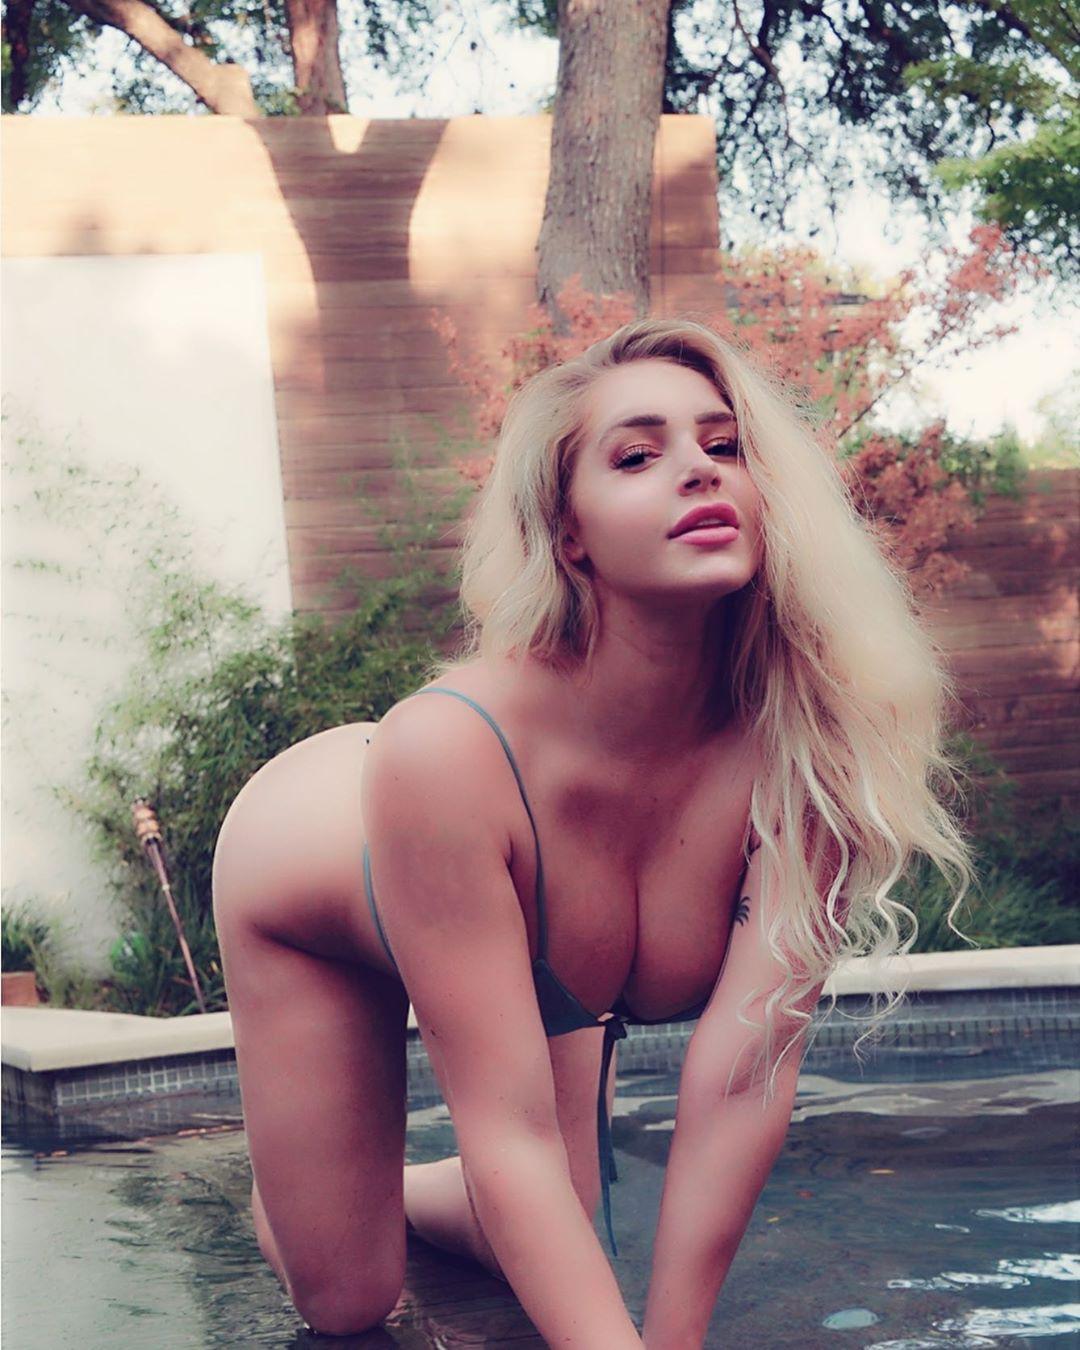 Courtney Tailor Hot Instagram Photos, Social network